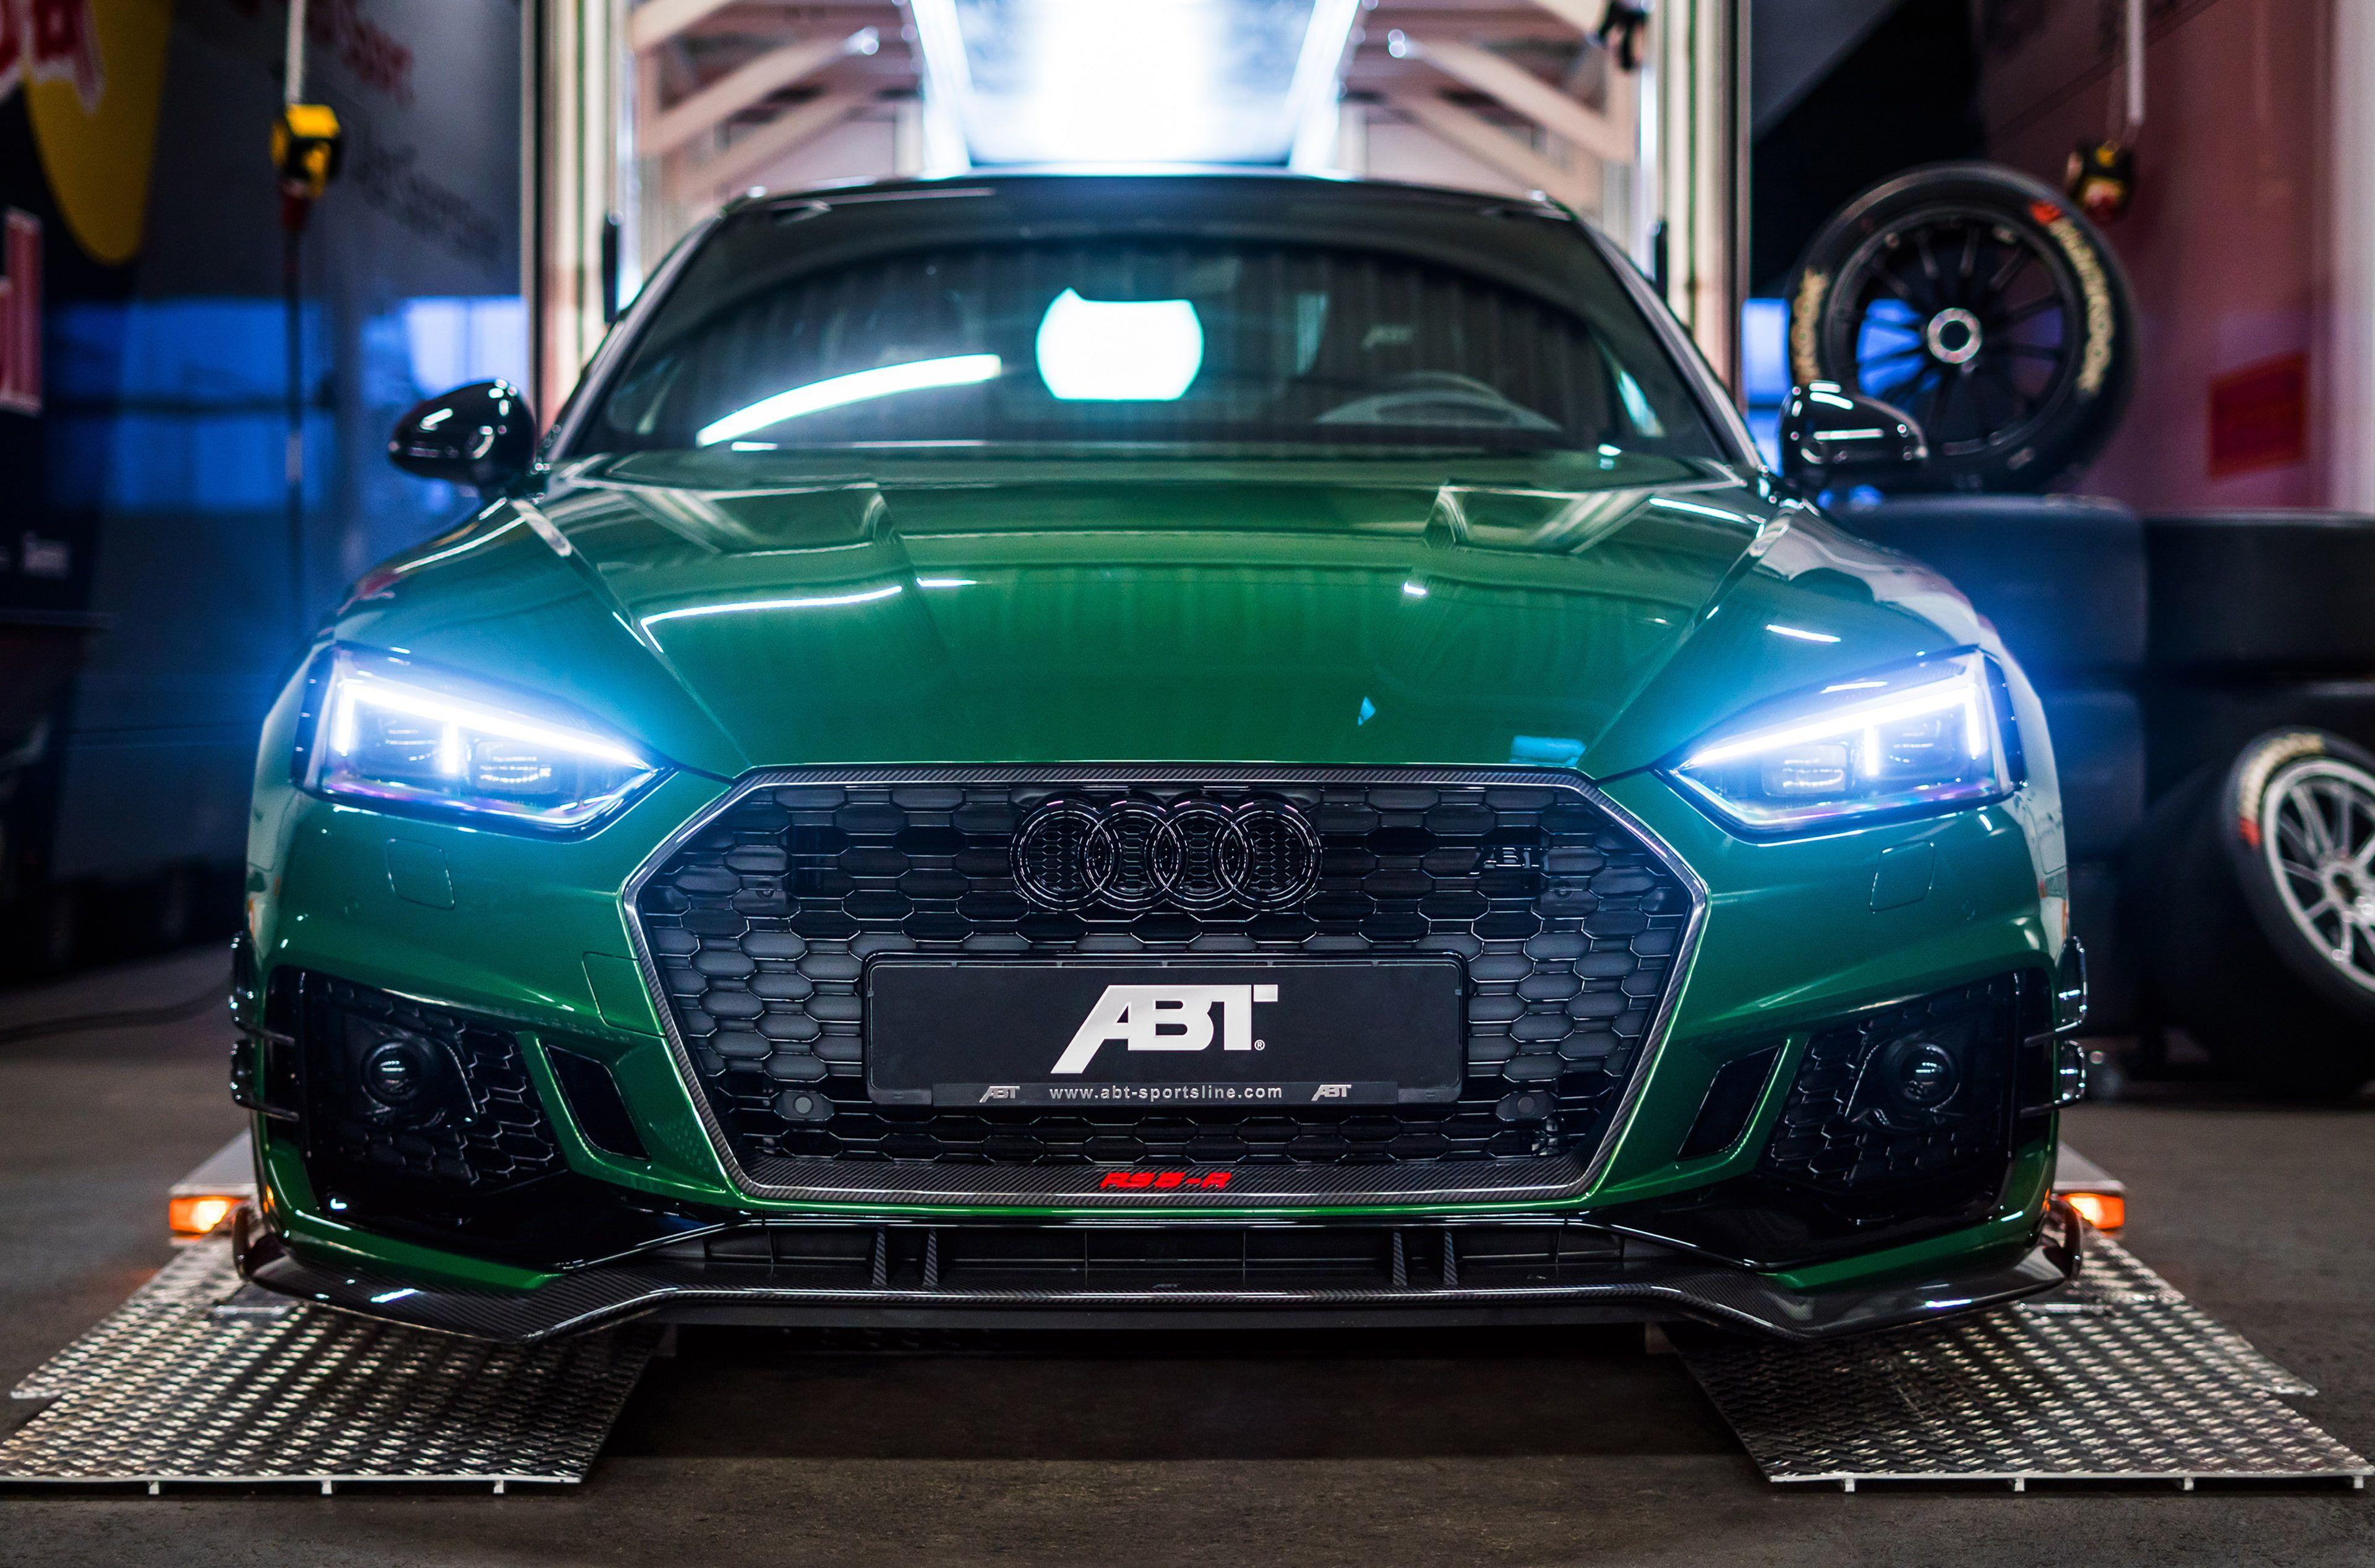 Abt Sportsline Audi Rs 5 R Coupe 2018 4k 4k Wallpaper Hdwallpaper Desktop Audi Rs Audi Audi Sedan